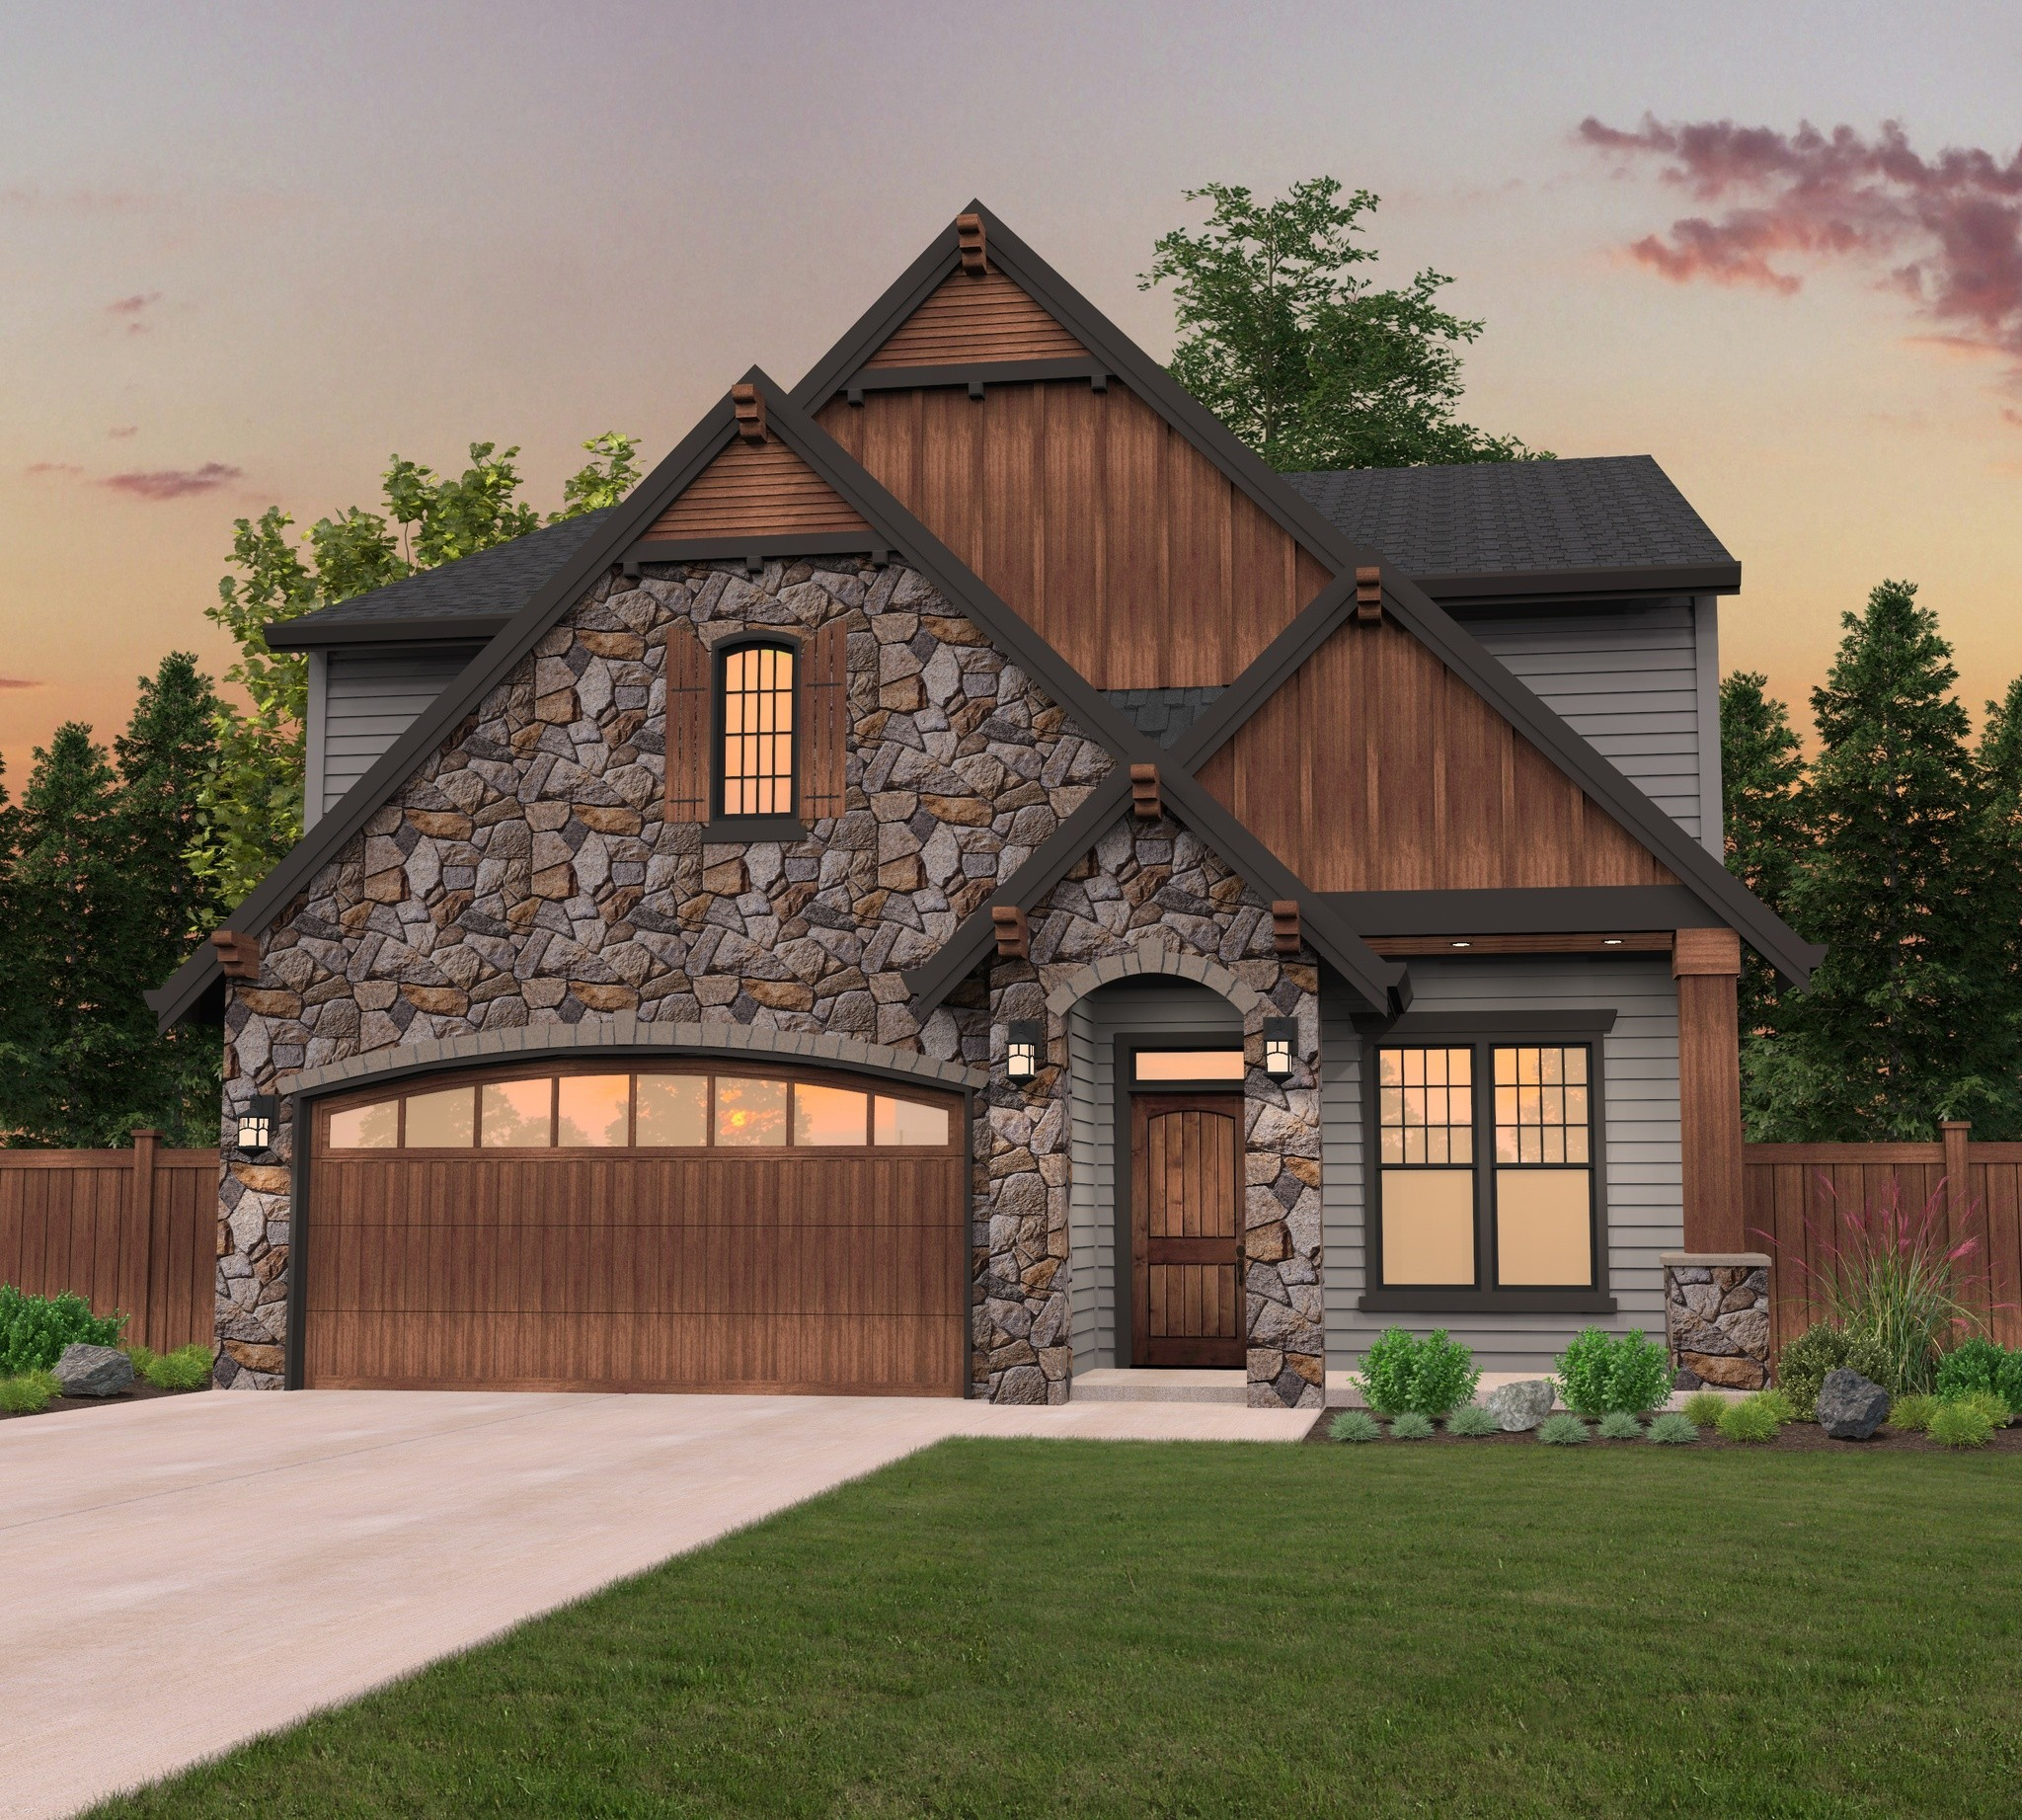 Modern Craftsman House Plans | Custom Craftsman Home Designs with Photos